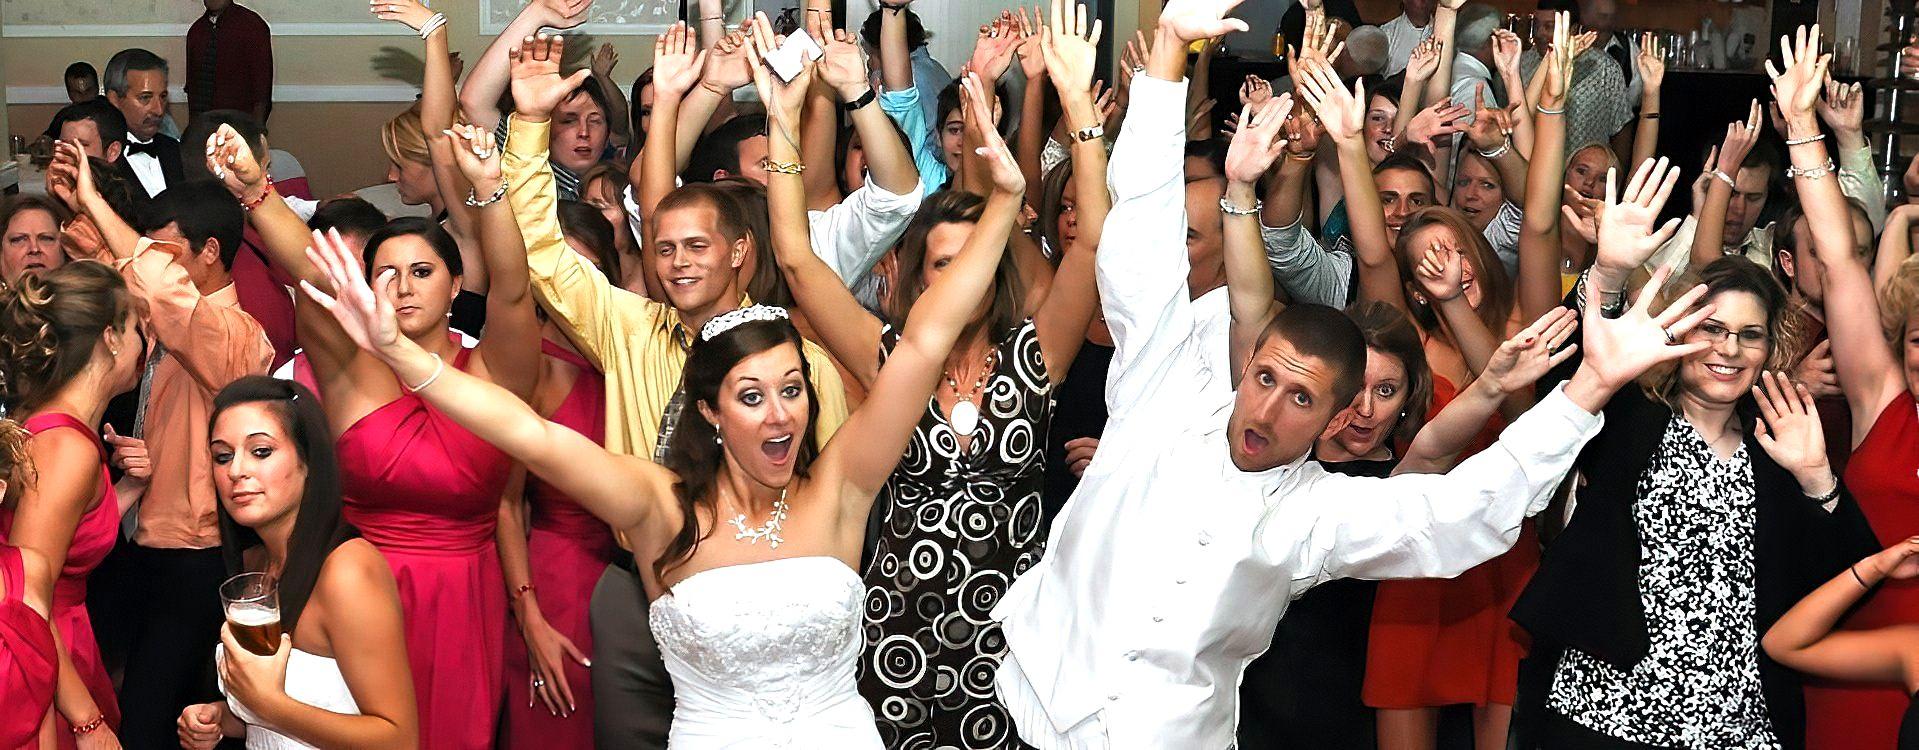 Contact The Wedding DJ